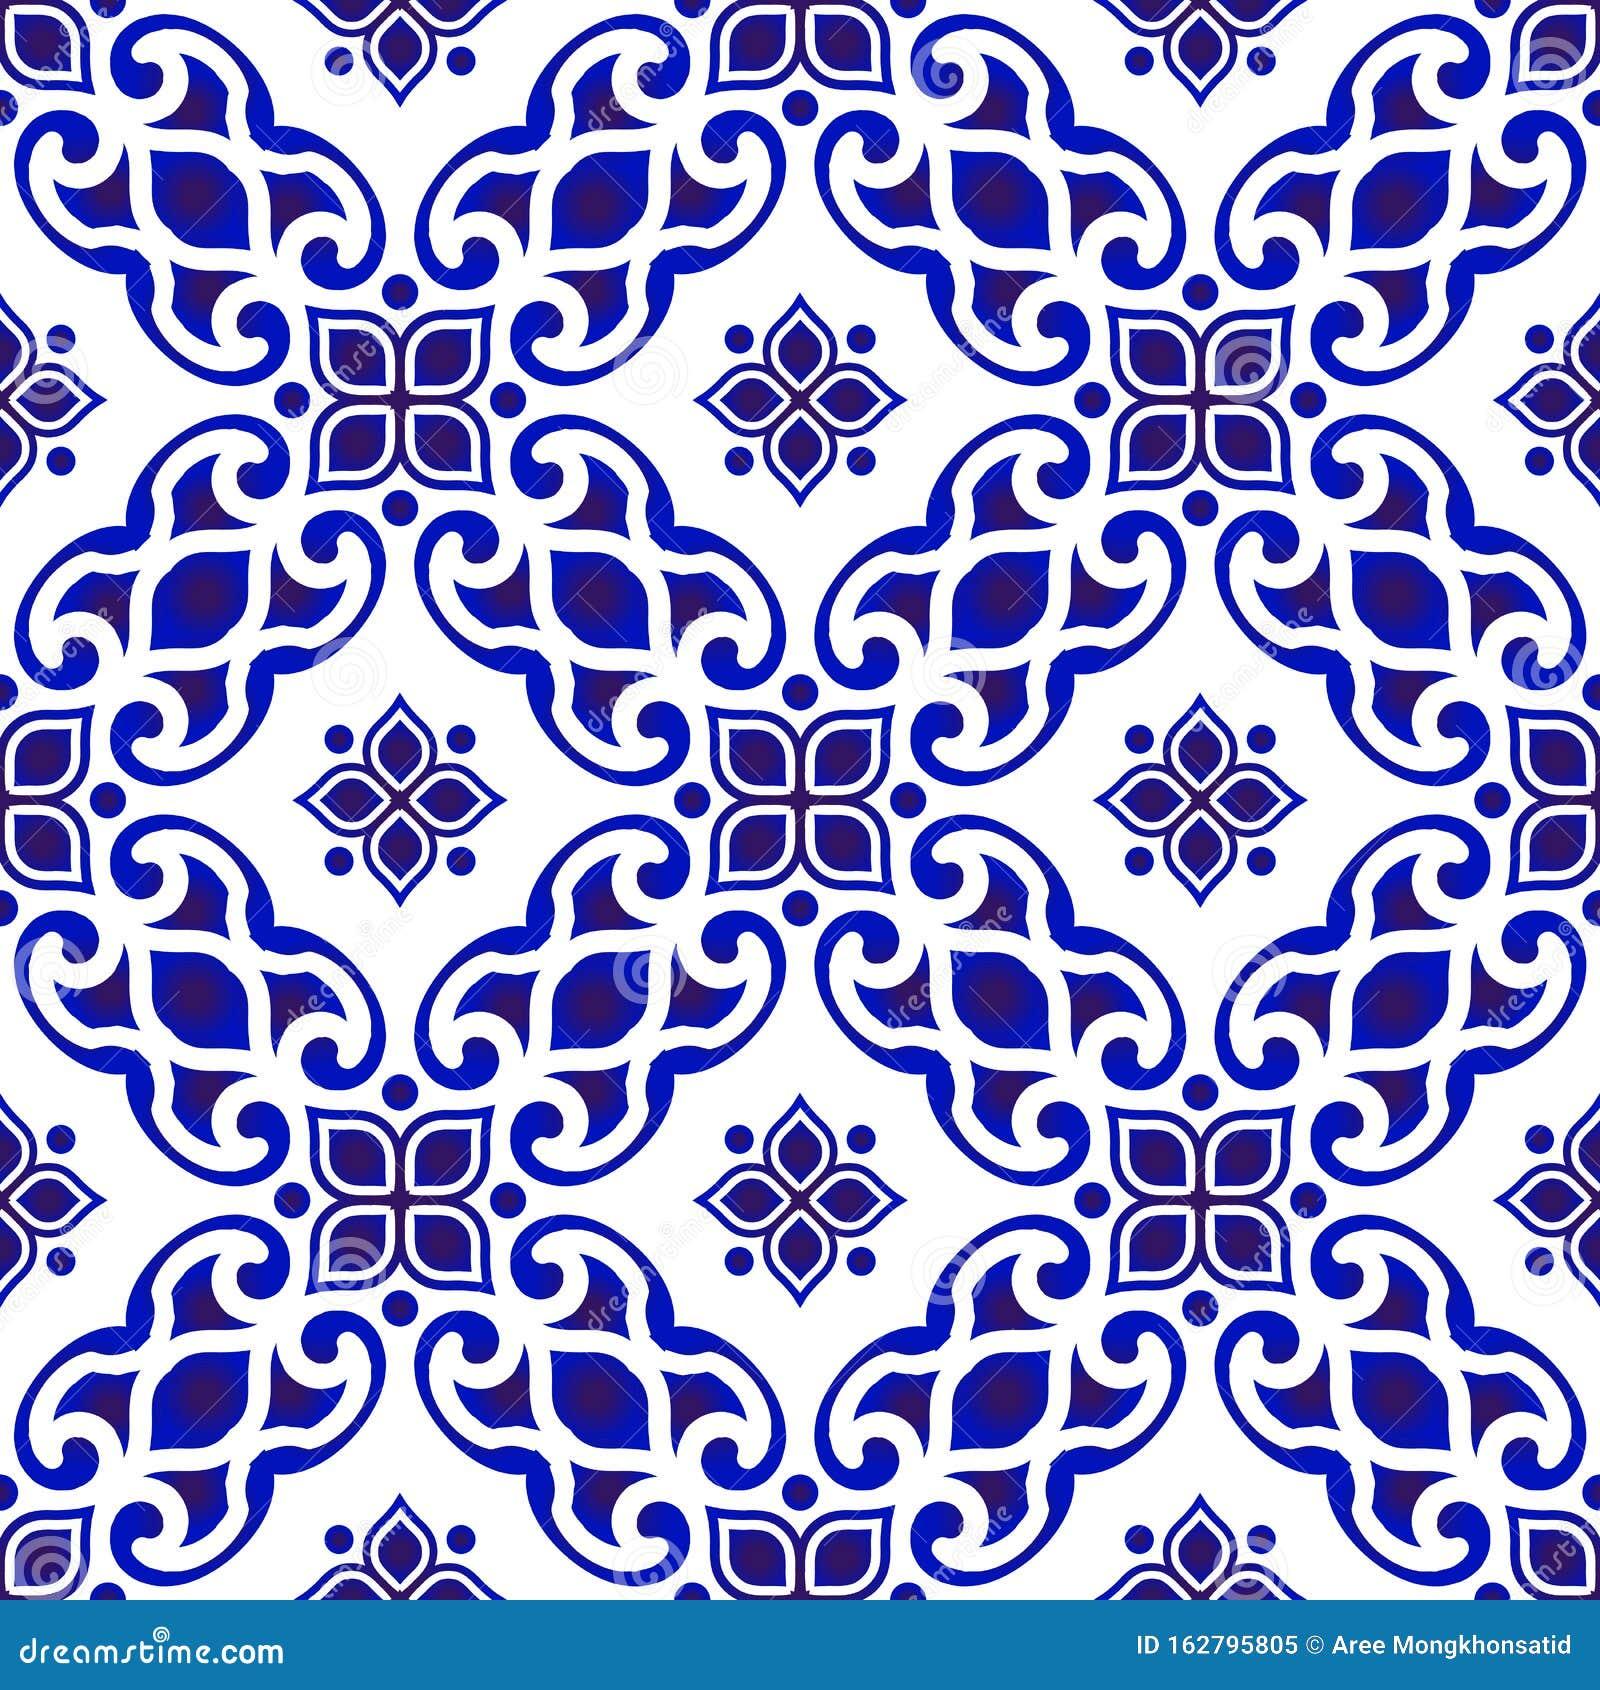 Blue And White Batik Pattern Stock Vector